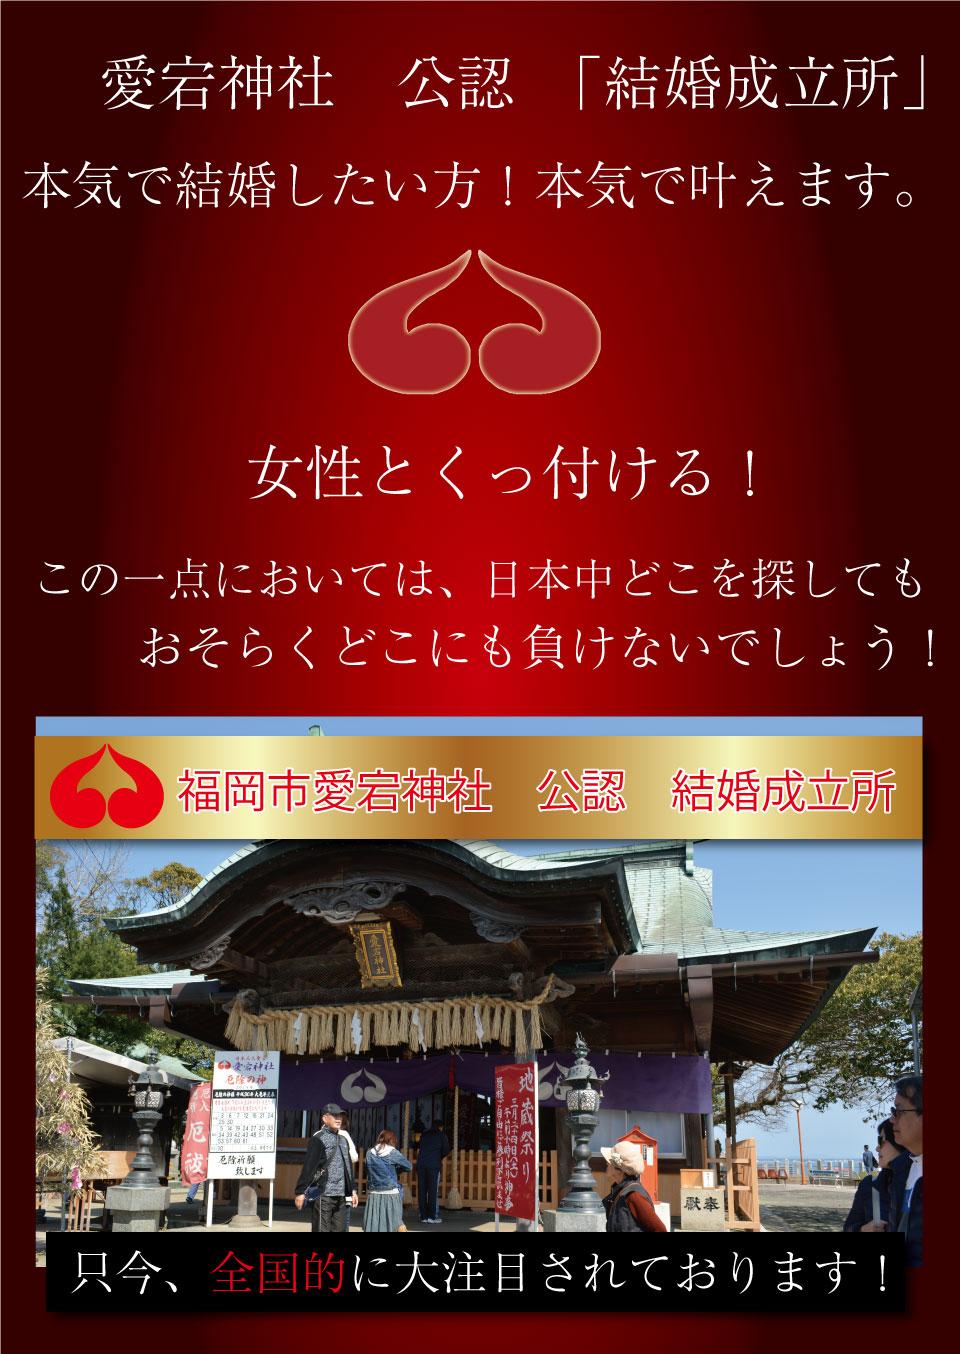 hiroshima_3_temp